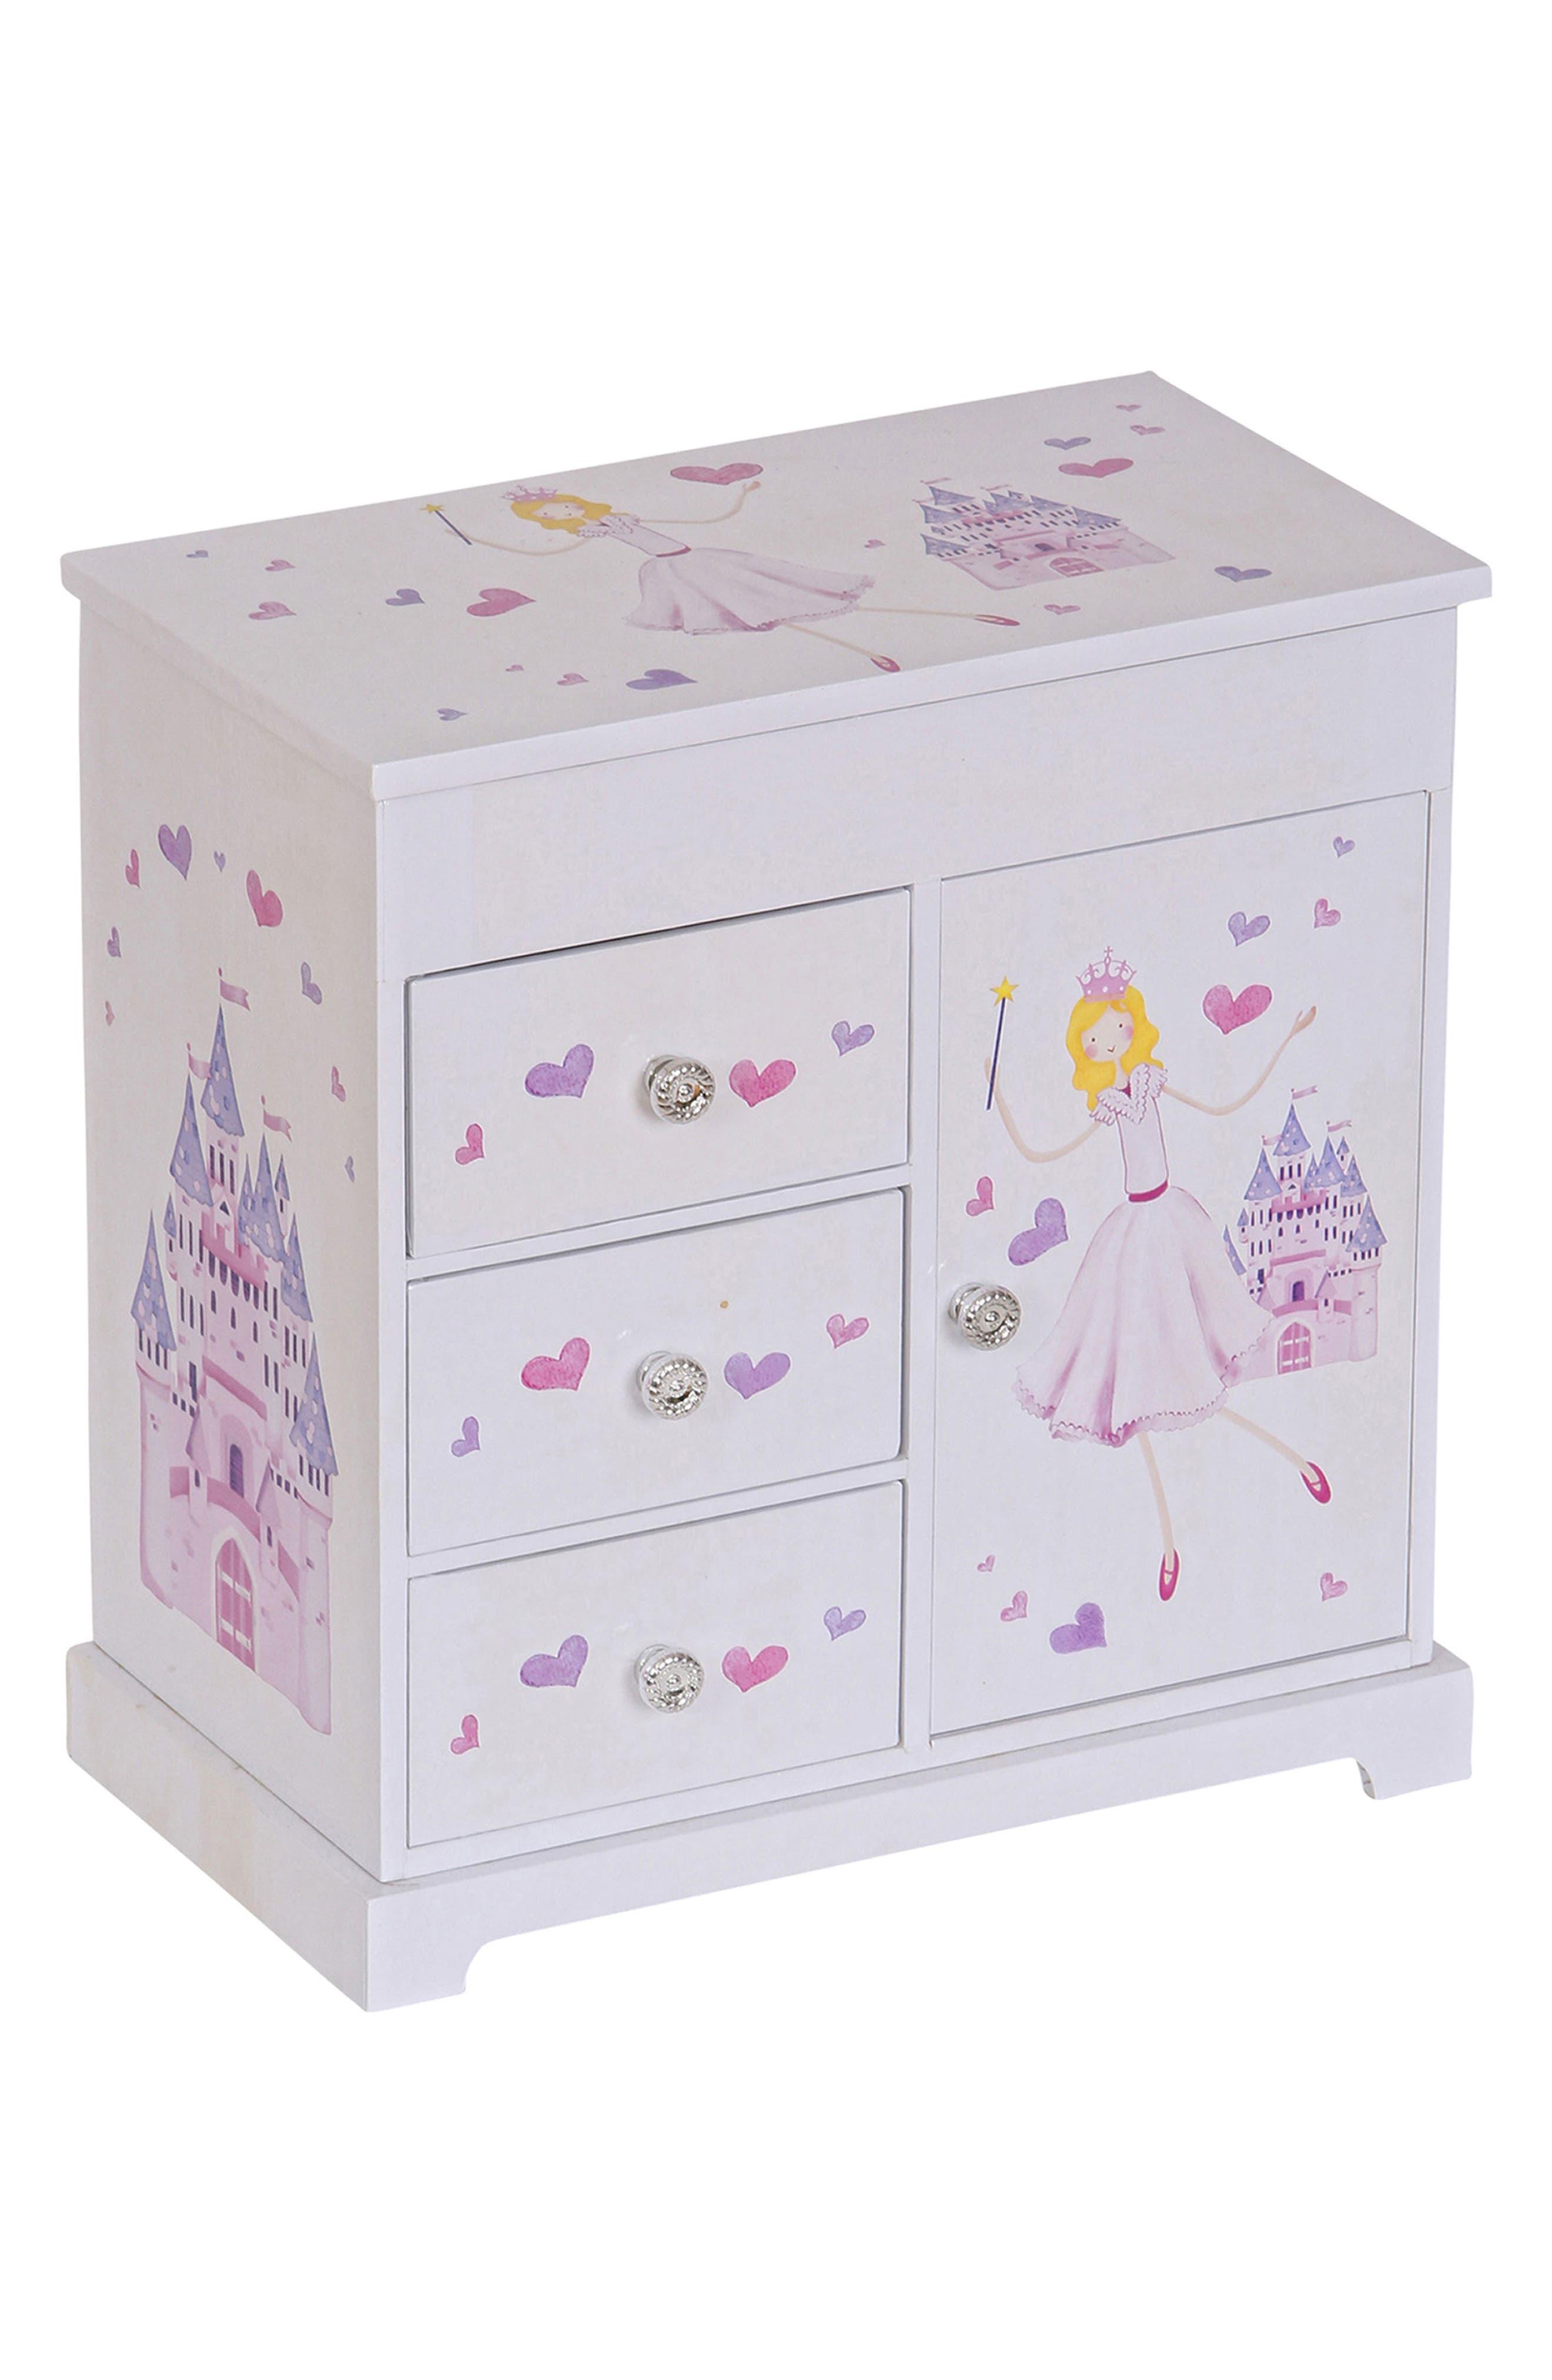 Alternate Image 1 Selected - Mele & Co. Adalyn Musical Jewelry Box (Girls)